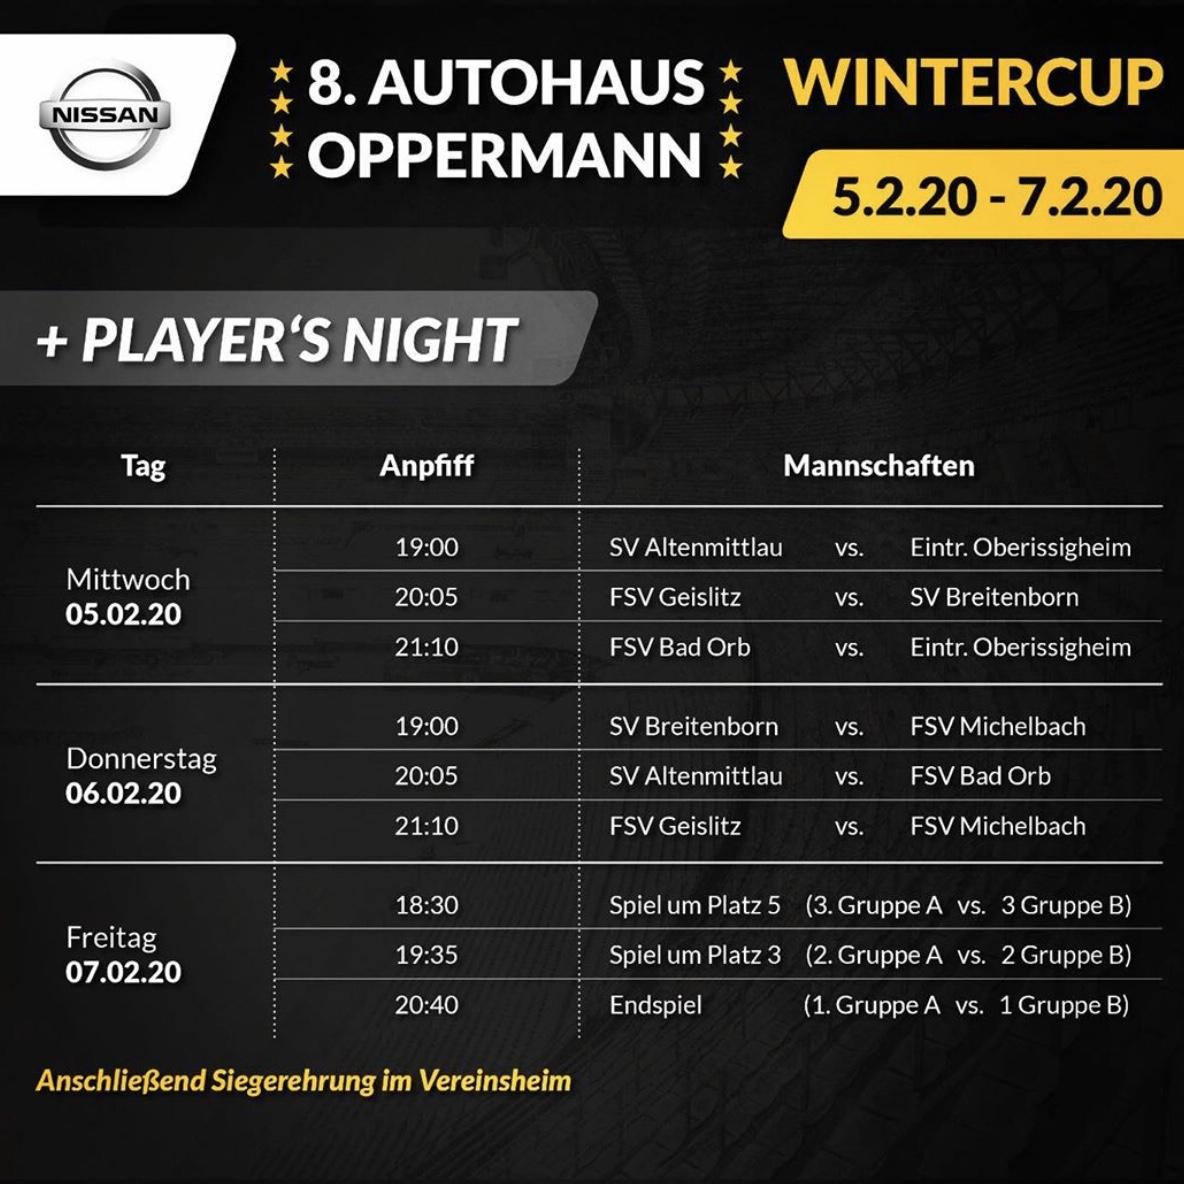 Autohaus Oppermann Wintercup 2020